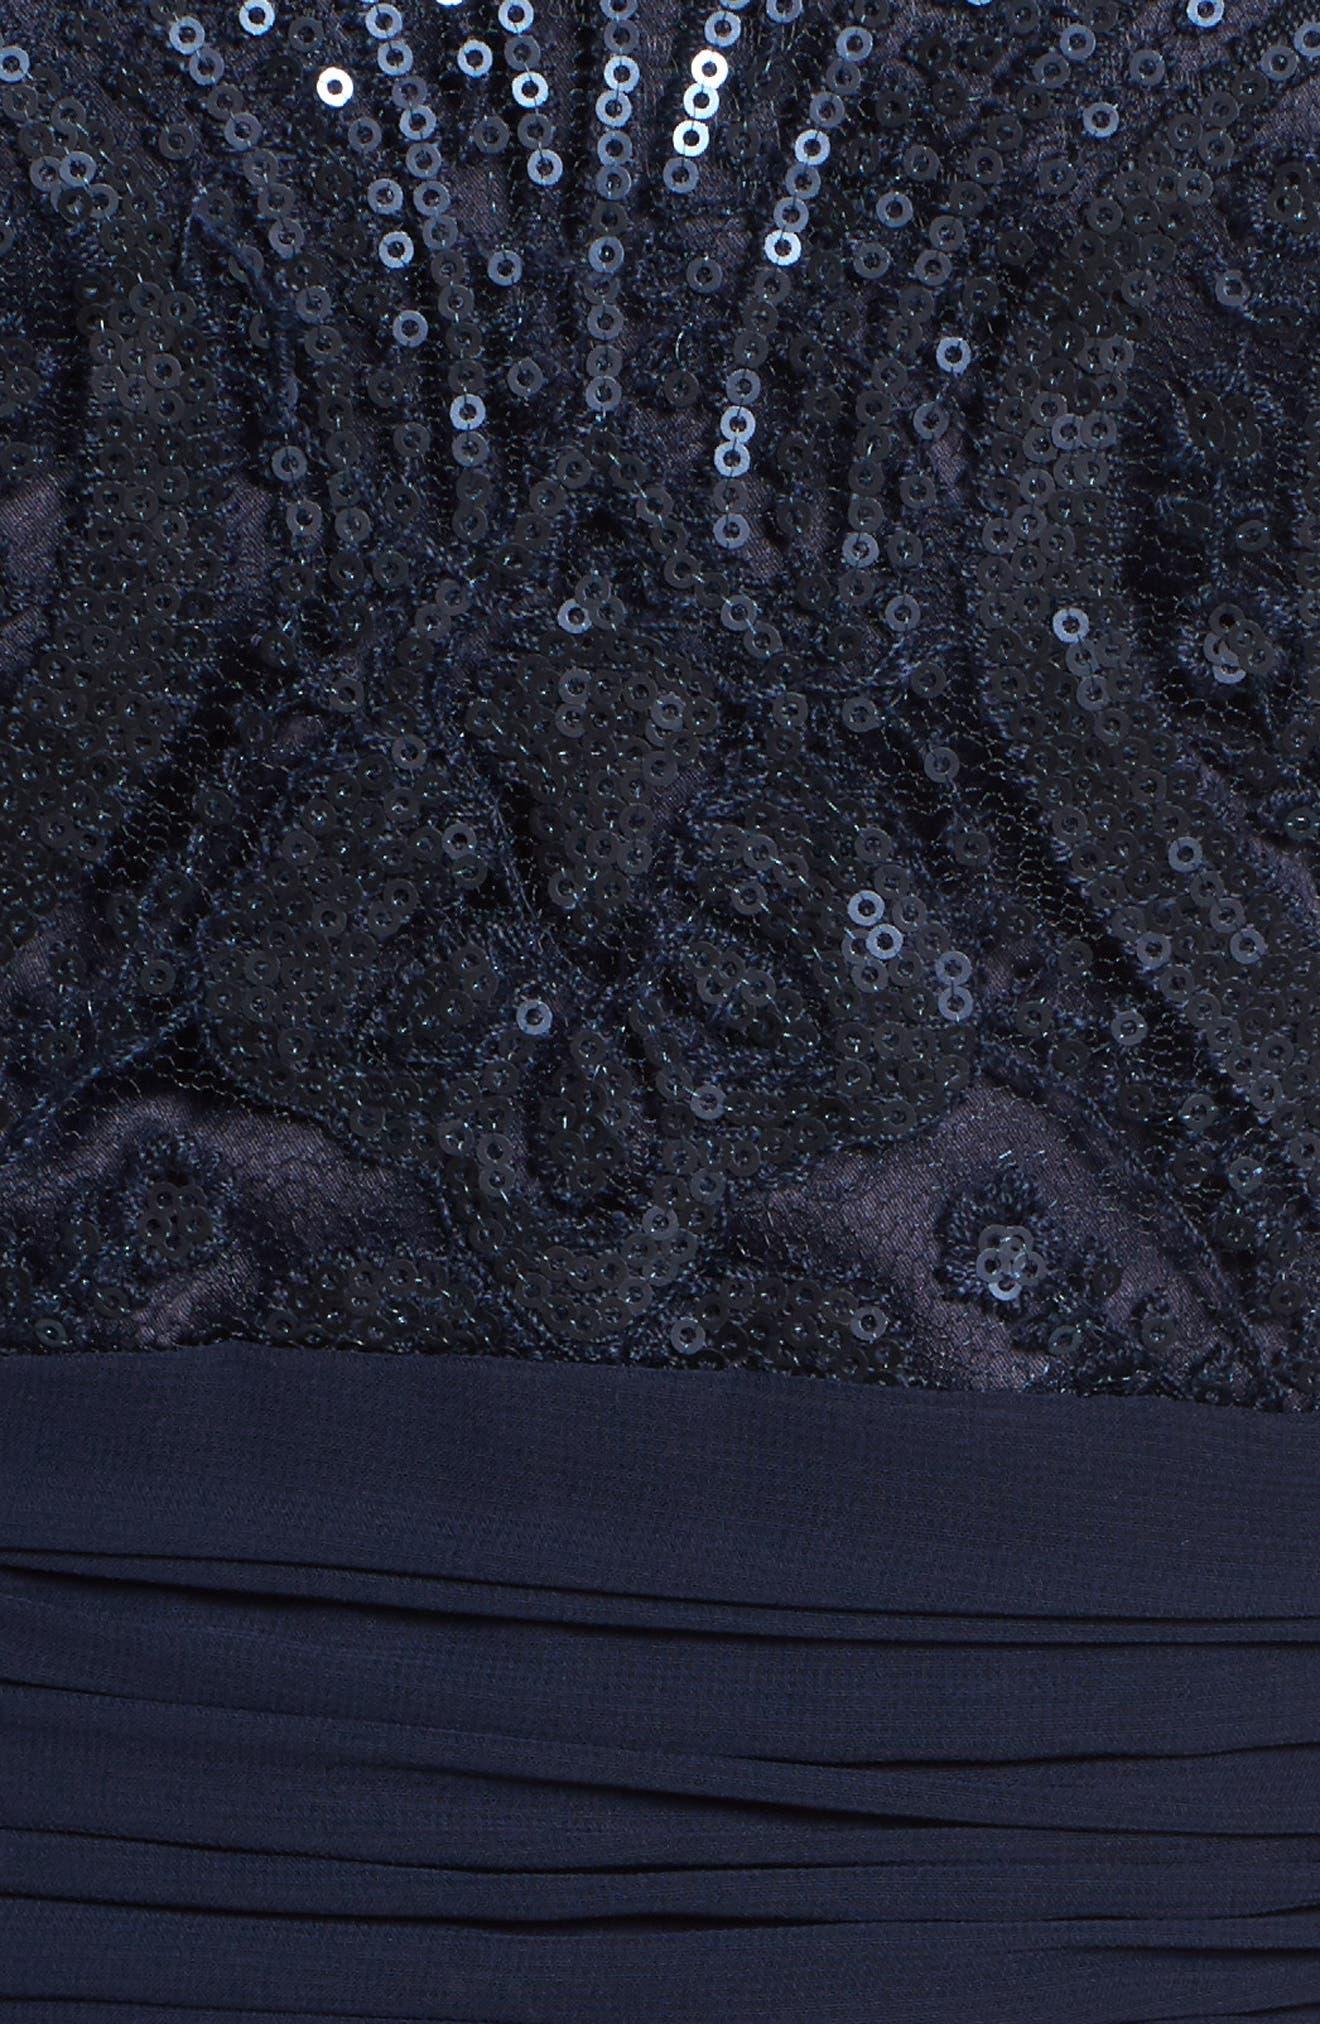 Lace Bodice Gown,                             Alternate thumbnail 20, color,